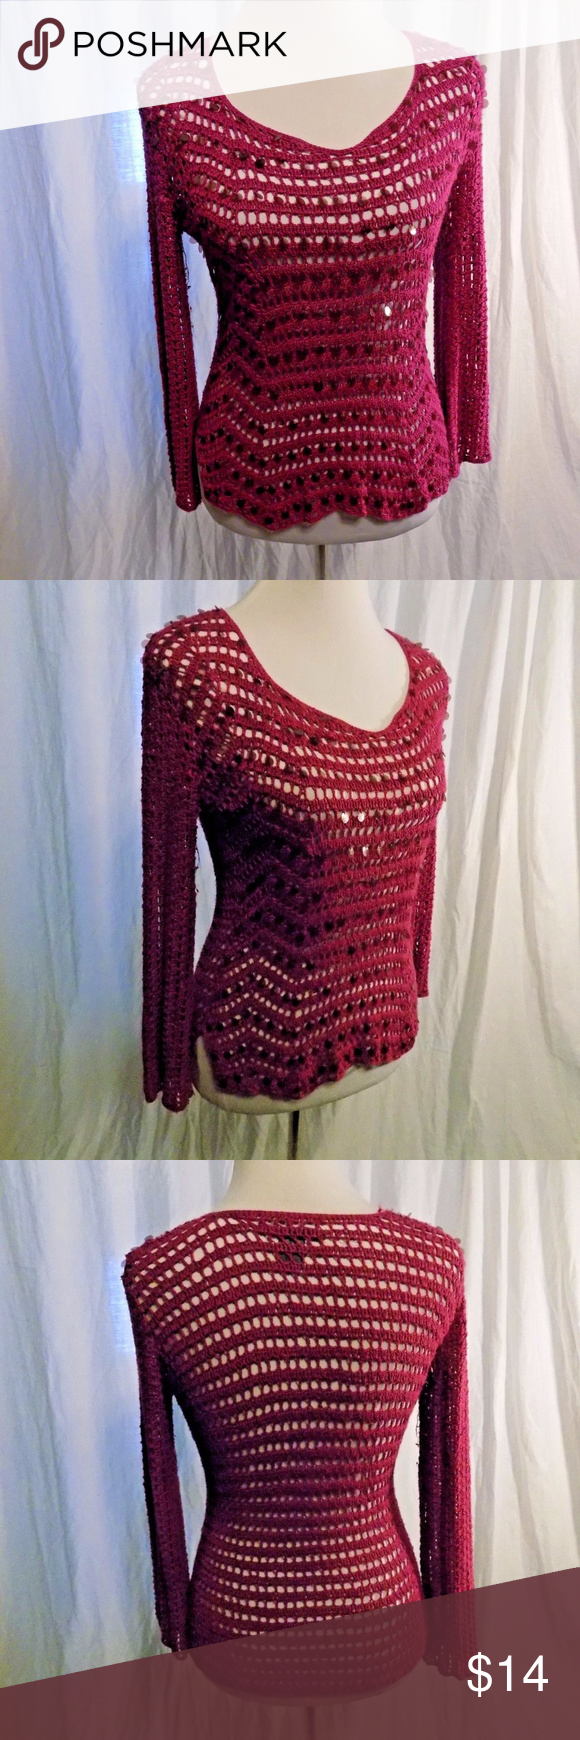 Bette Sung L Purple Sweater Crochet Knit Scoop Brand: Bette Sung ...